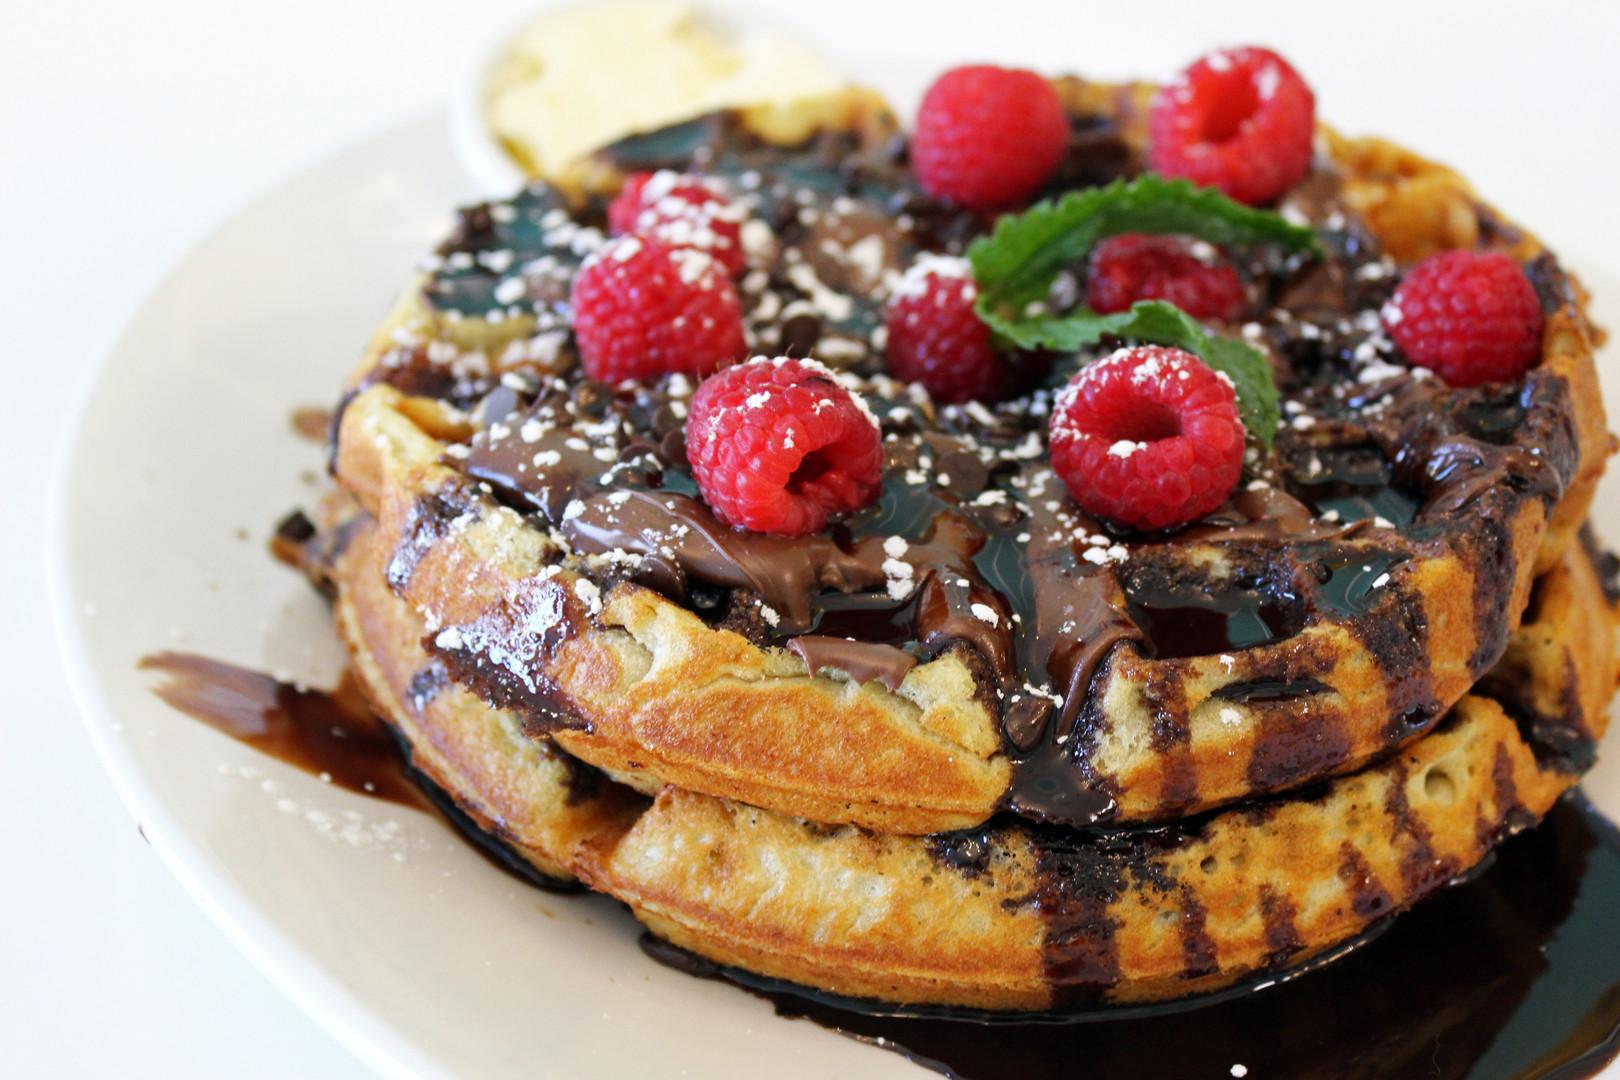 Breakfast Club Chocolate Chocolate Waffl